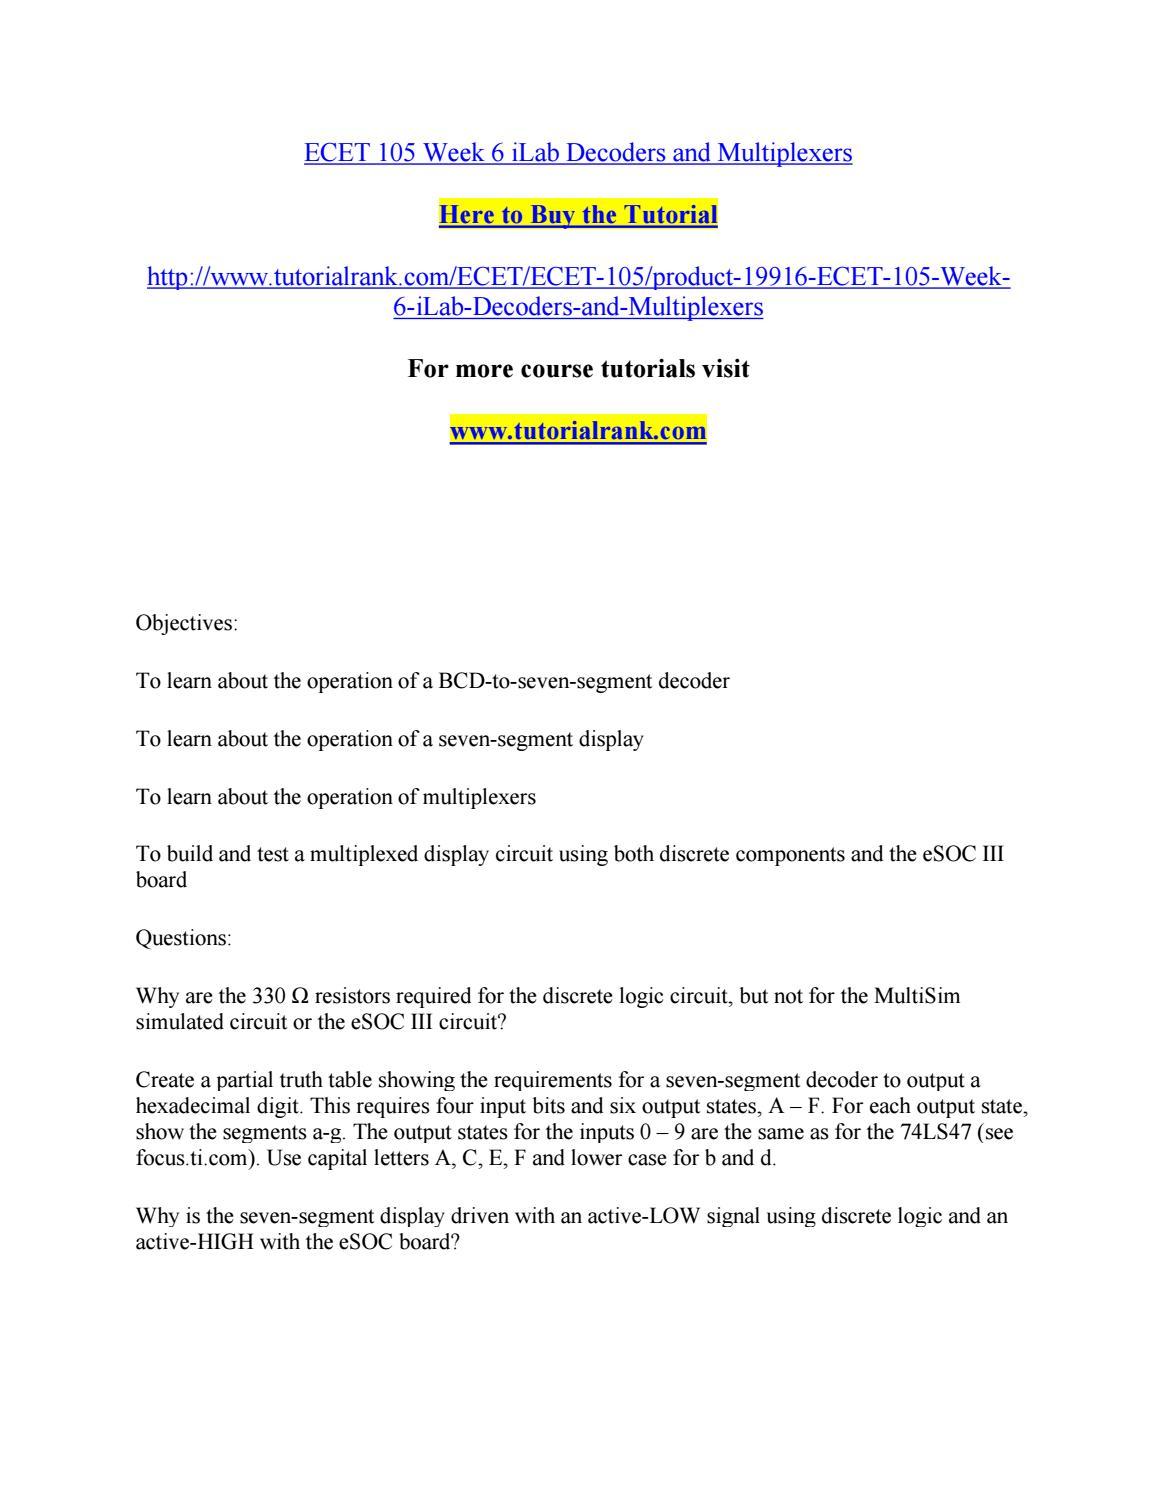 Ecet 105 Week 6 Ilab Decoders And Multiplexers By Robertsonhunt2 Issuu Multiplexer Logic Diagram Truth Table